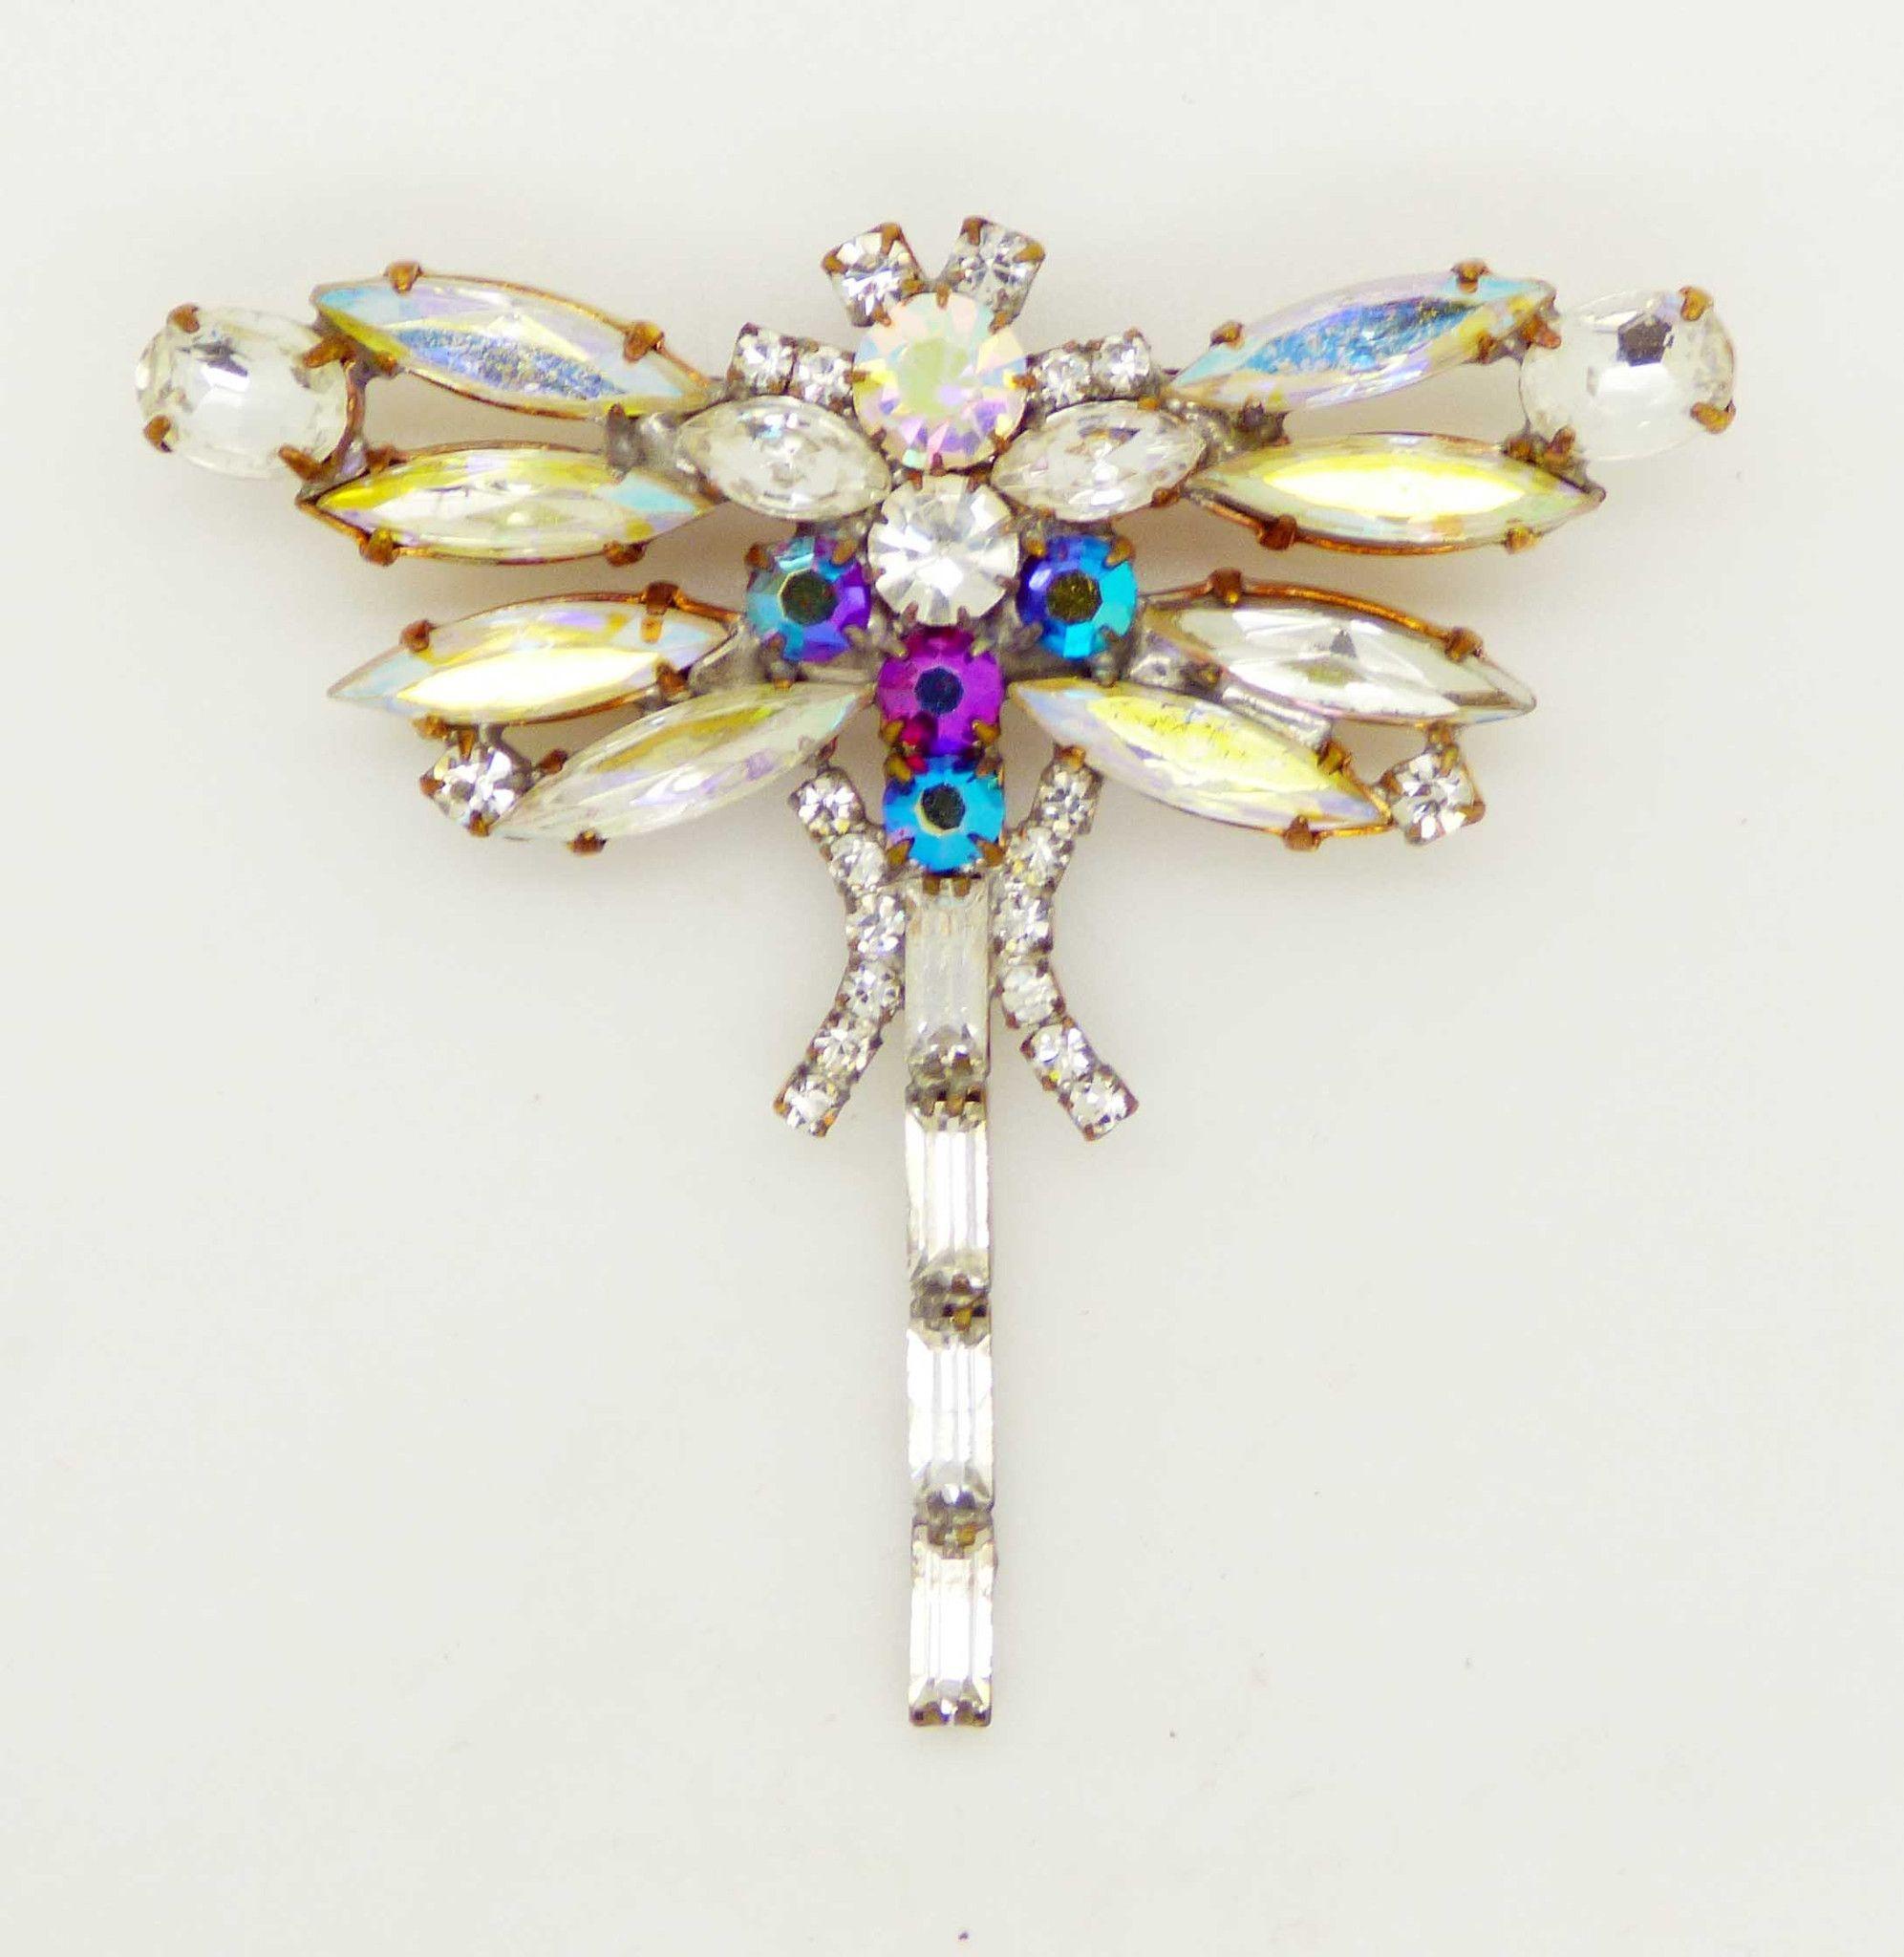 Czech Glass AB Rhinestone Dragonfly Brooch, Figural Pin